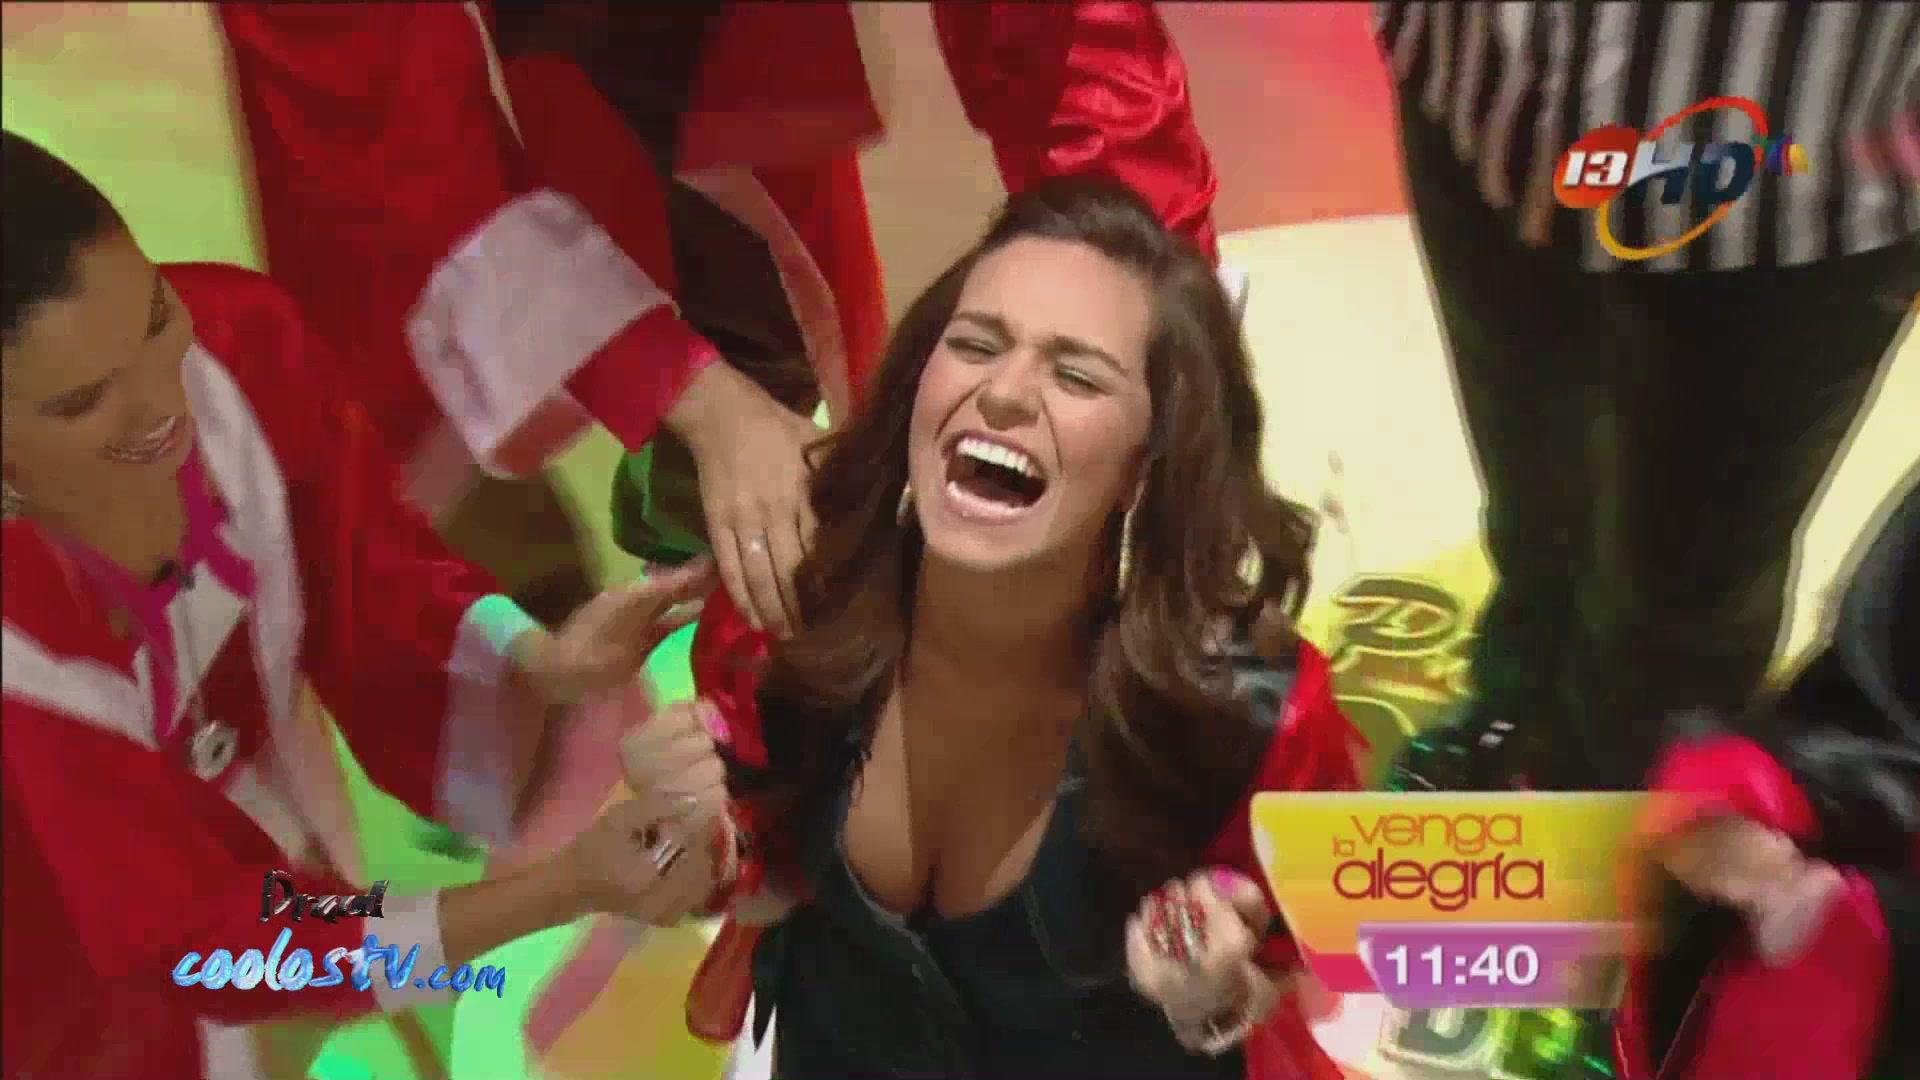 Camila Sodi Tetas tania.rincon.culito.tetaszclilla.hd1080 | coolostv